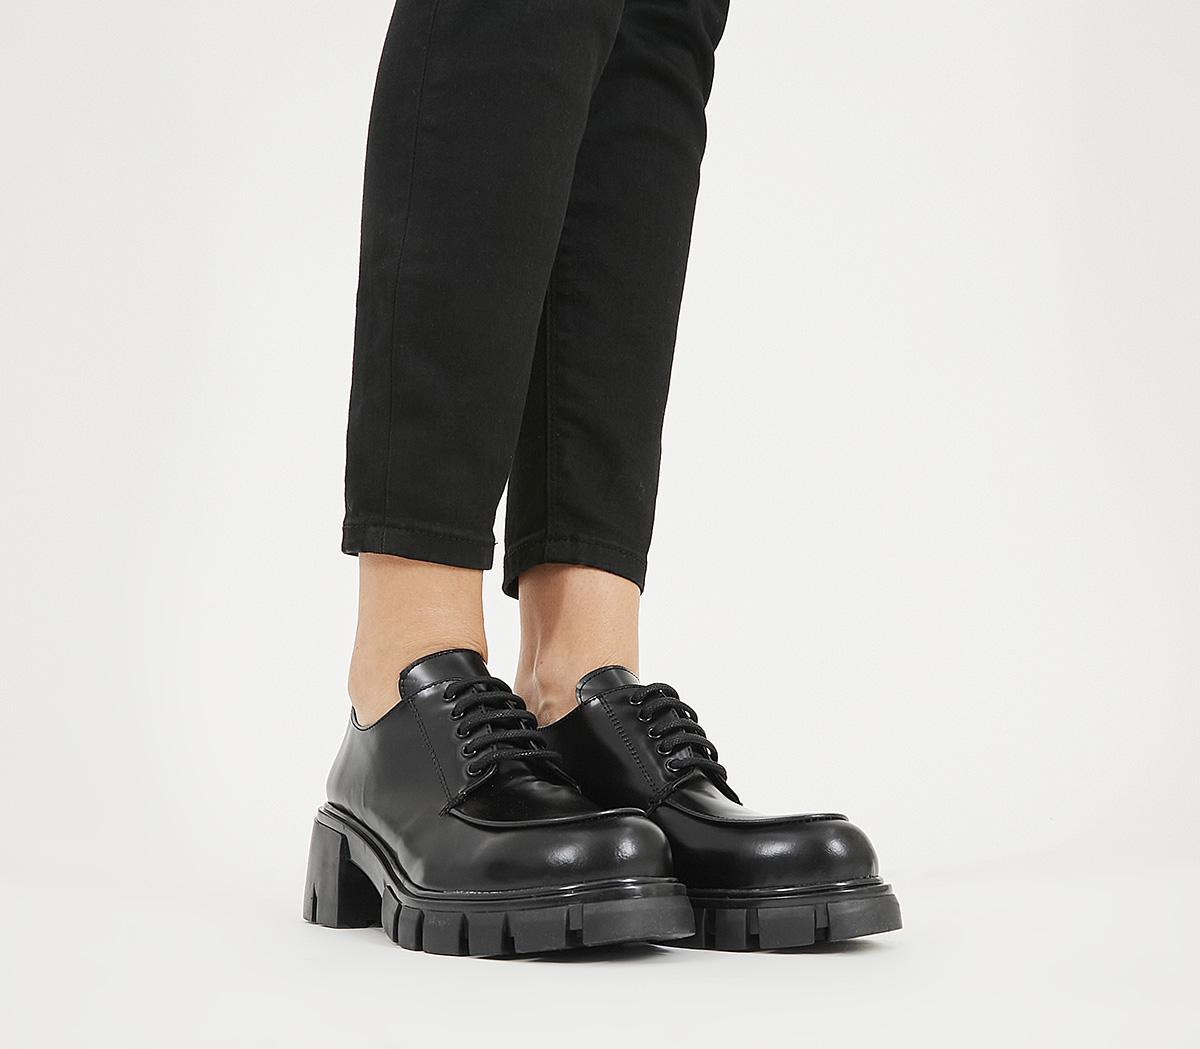 Office Matcha Chunky Sole Lace-up Black